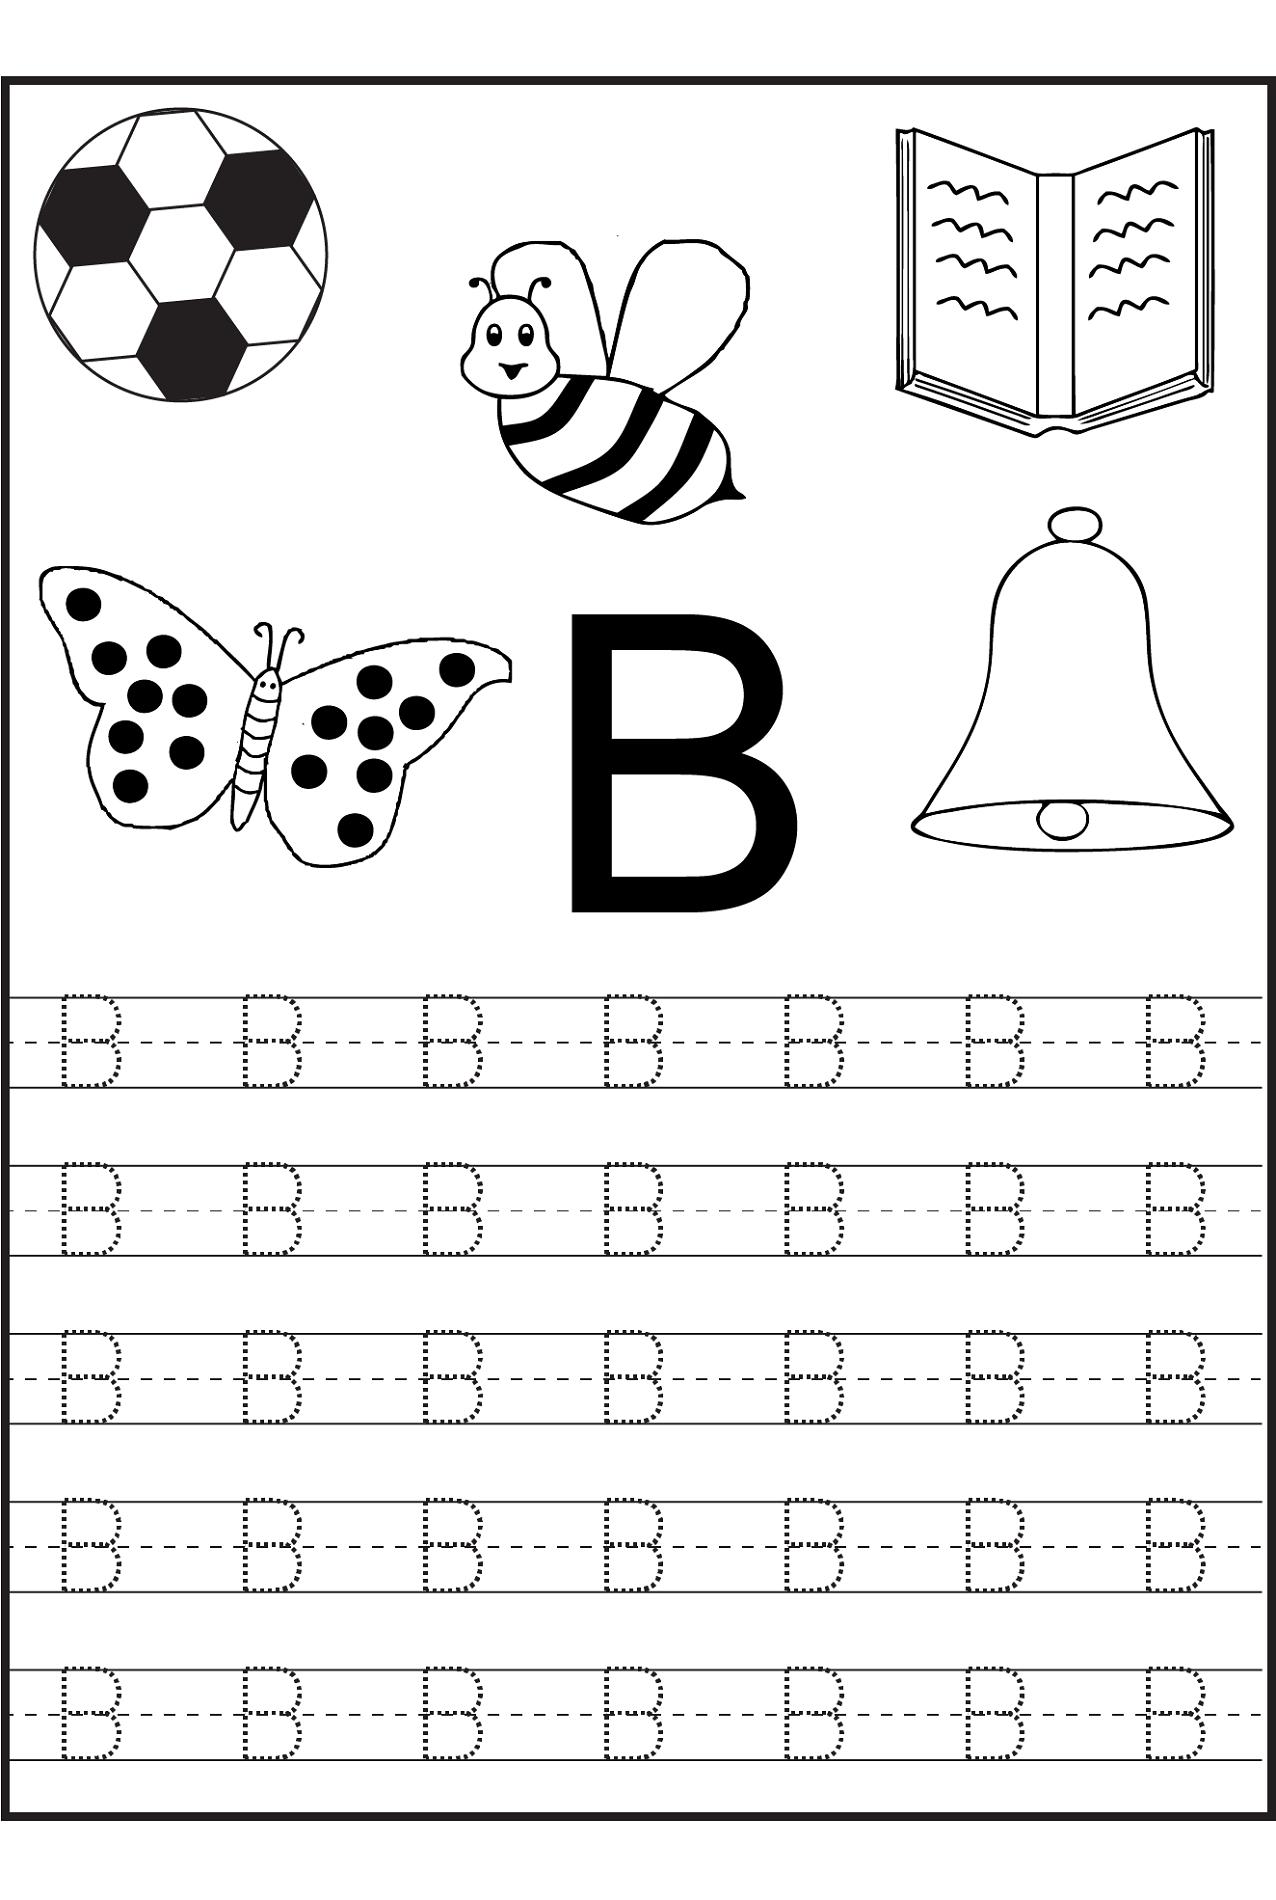 traceable letters worksheets letter B